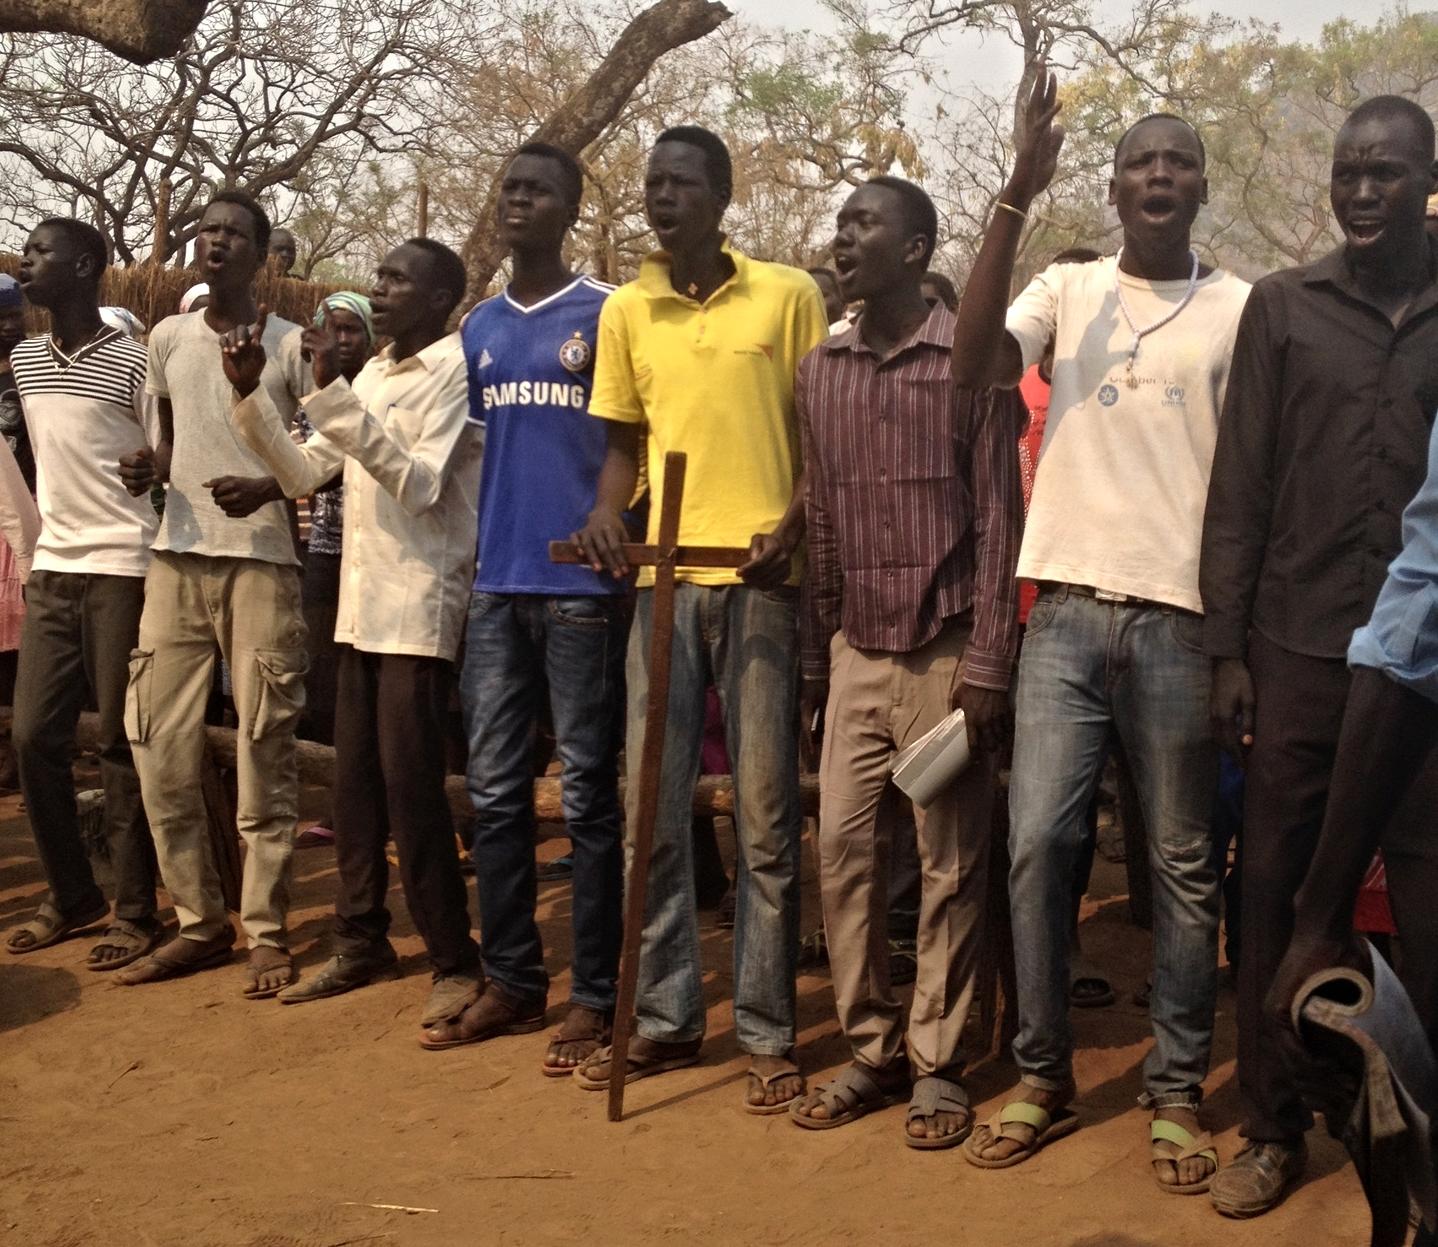 Older youth in refugee camp praising God in loud, fervent song.